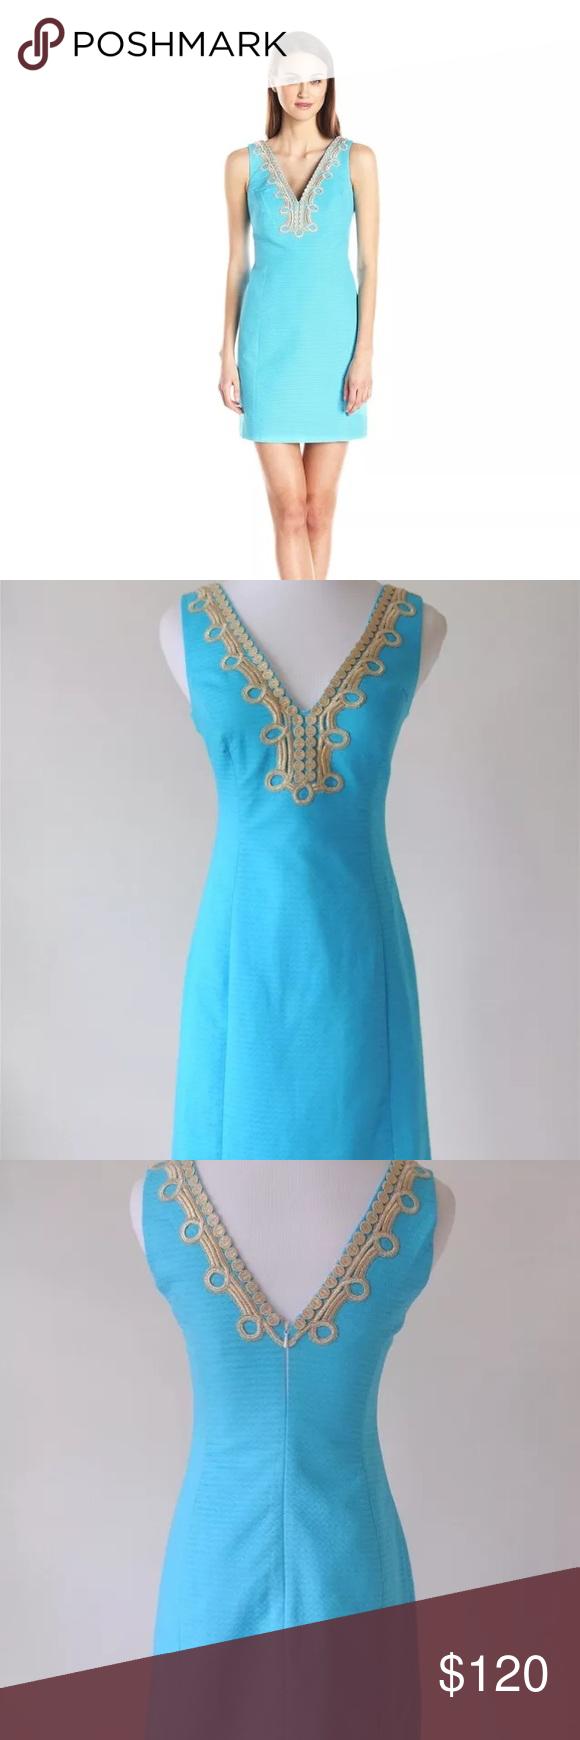 🎄Lilly Pulitzer Bentley Shift Dress   Dress lilly, Wedding guest ...